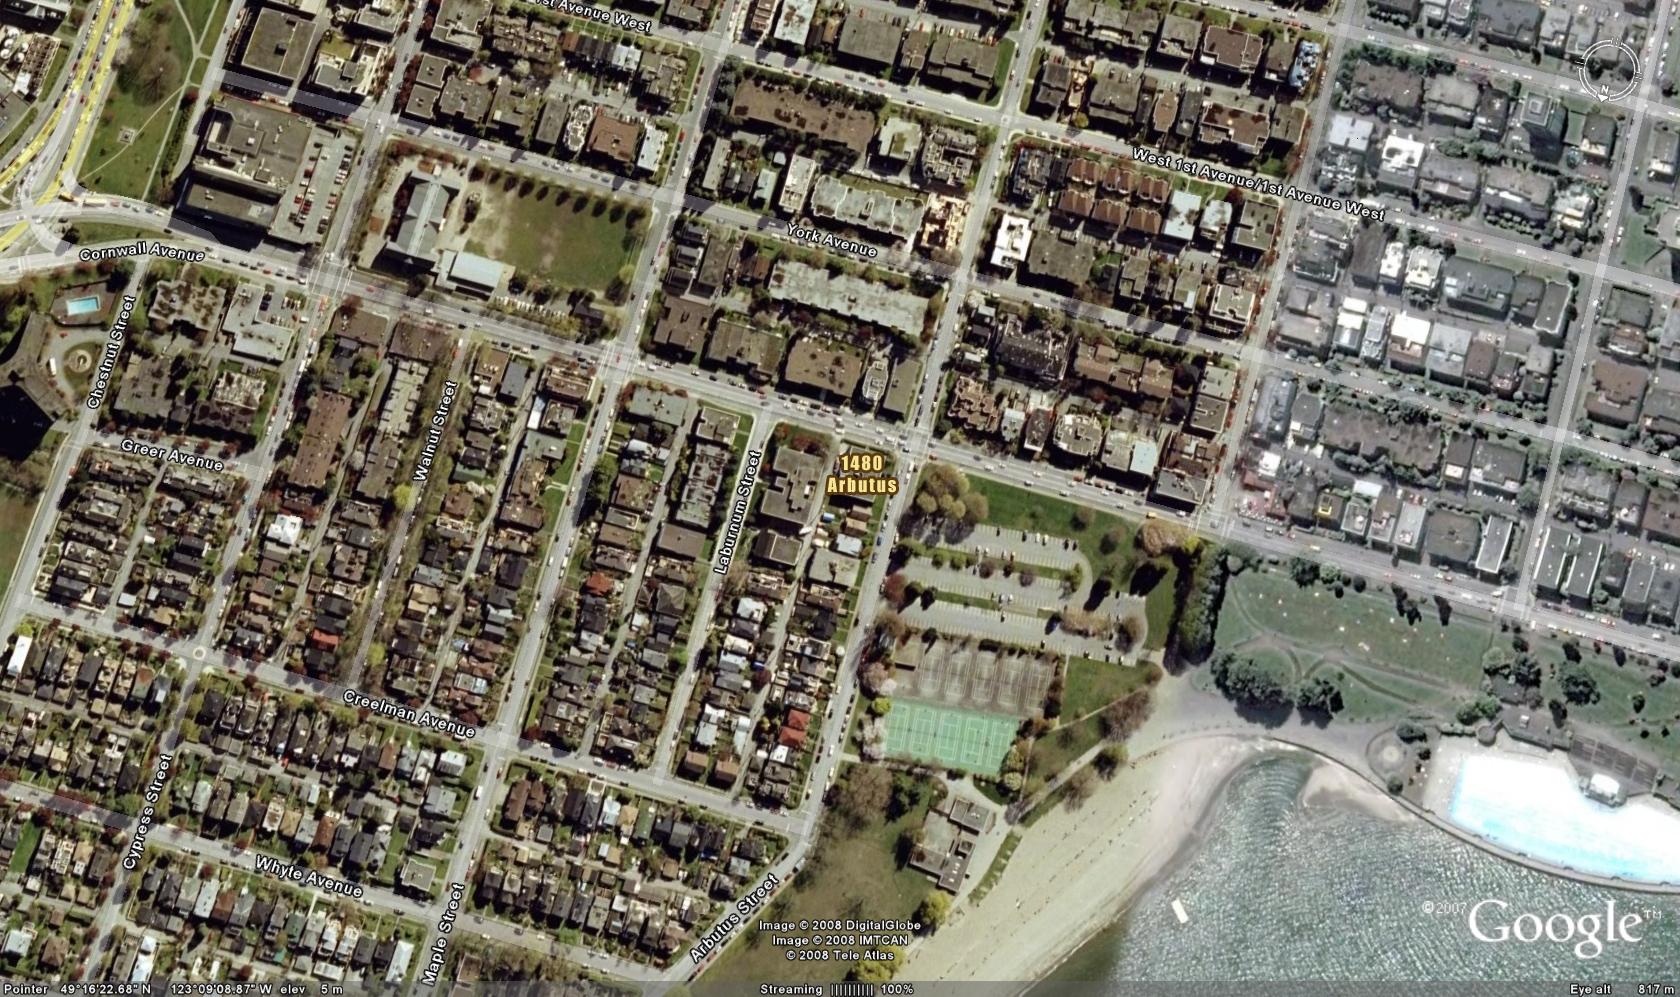 Print View Building Information For Seaview Manor Arbutus - Satellite street view